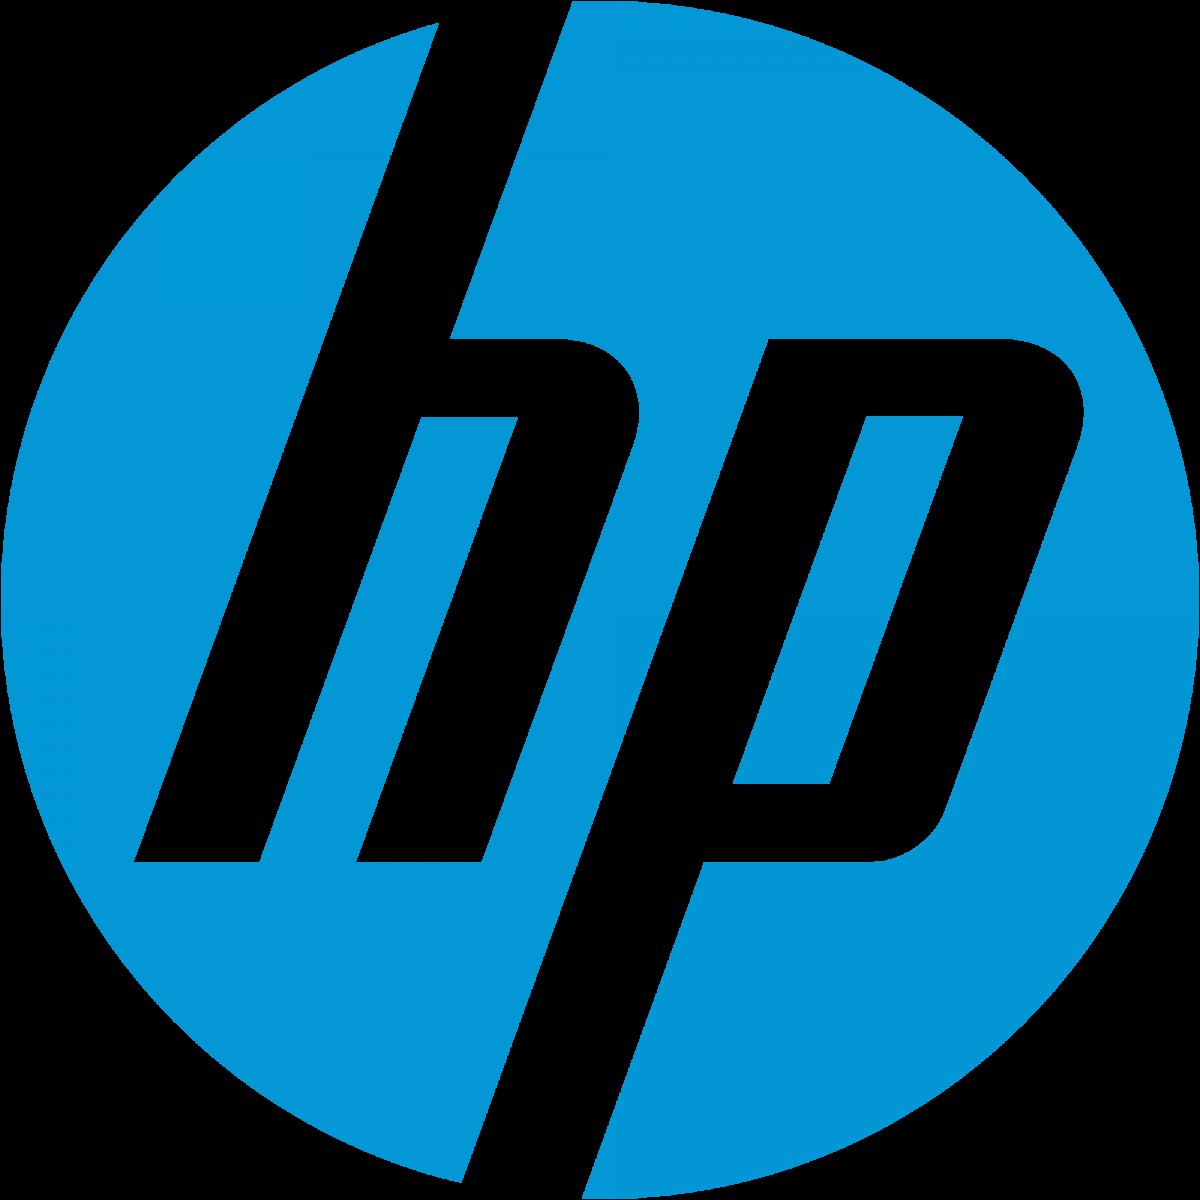 Switch HP JE005A Gigabit 20 portas ProCurve HP V1910-16G Rack (16 x Gigabit; 4 x Combo) (Antigo 3Com 3CRBSG2093) (JE005A)  - TNTinfo Loja